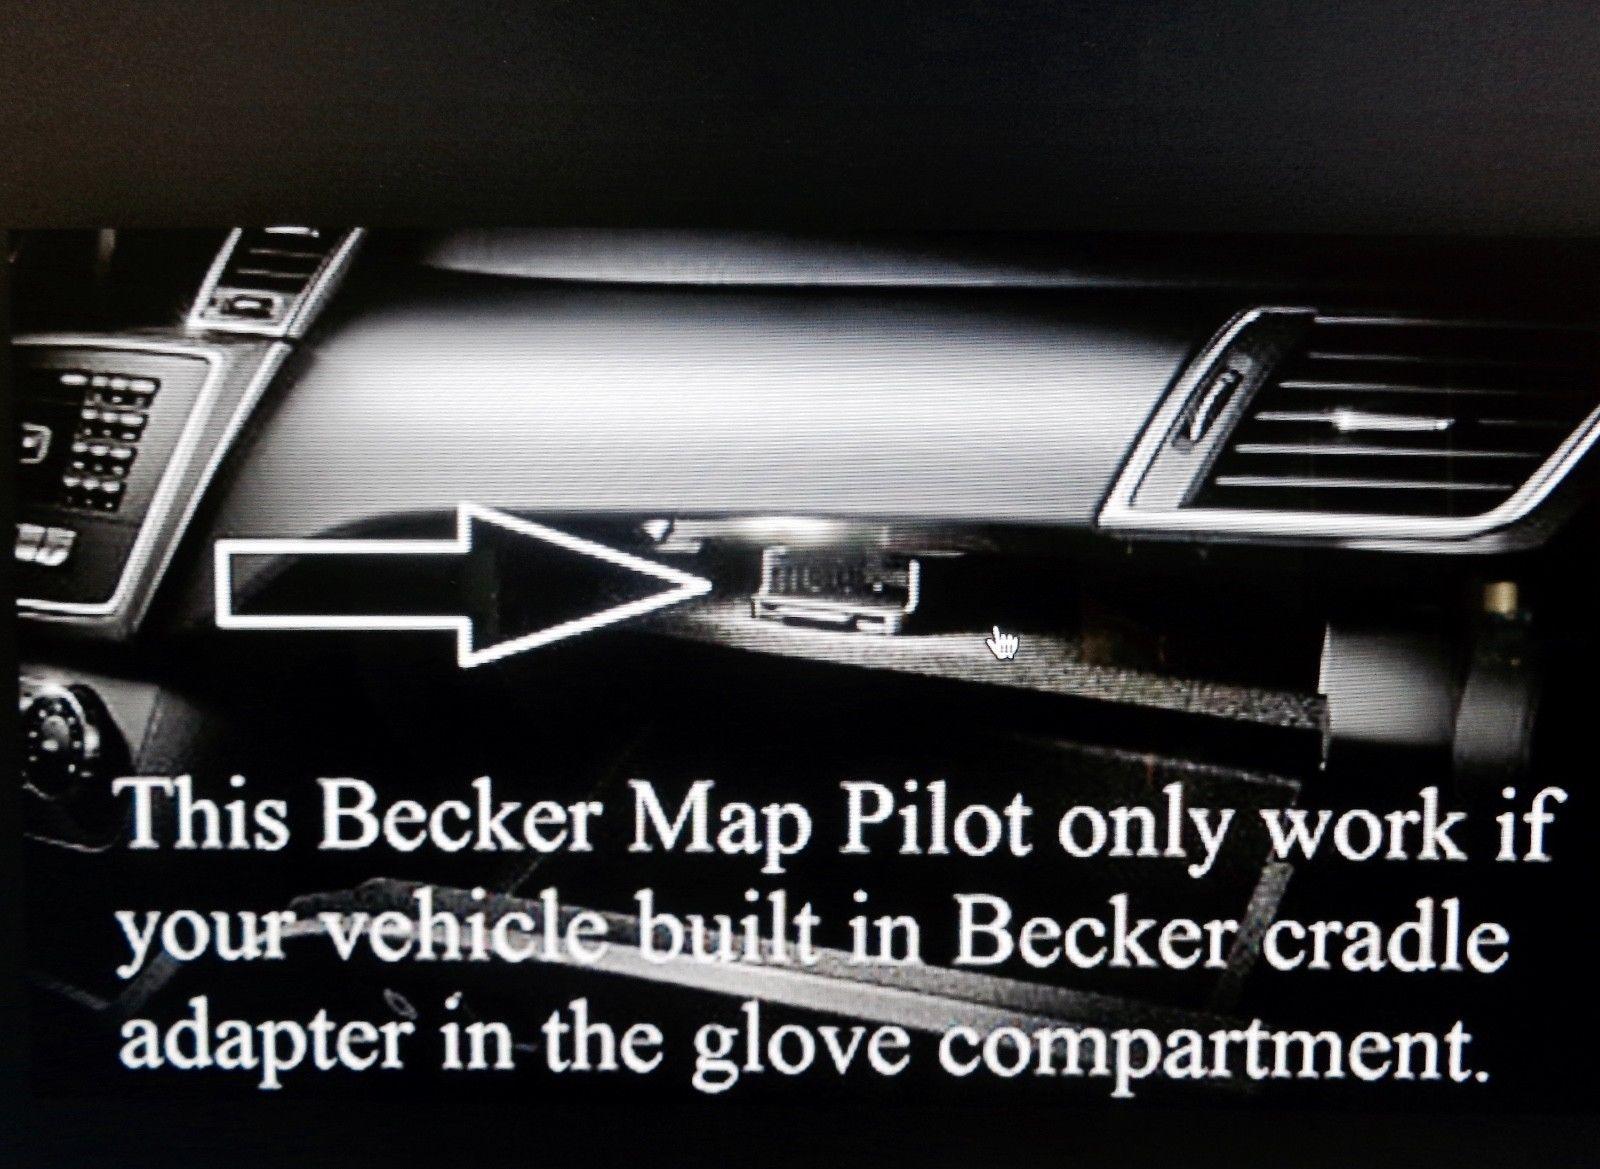 Great Latest 2013 -2016 Mercedes GLK SLK CLA C Becker Map Pilot Navigation  U S Q2/2019 2017/2018